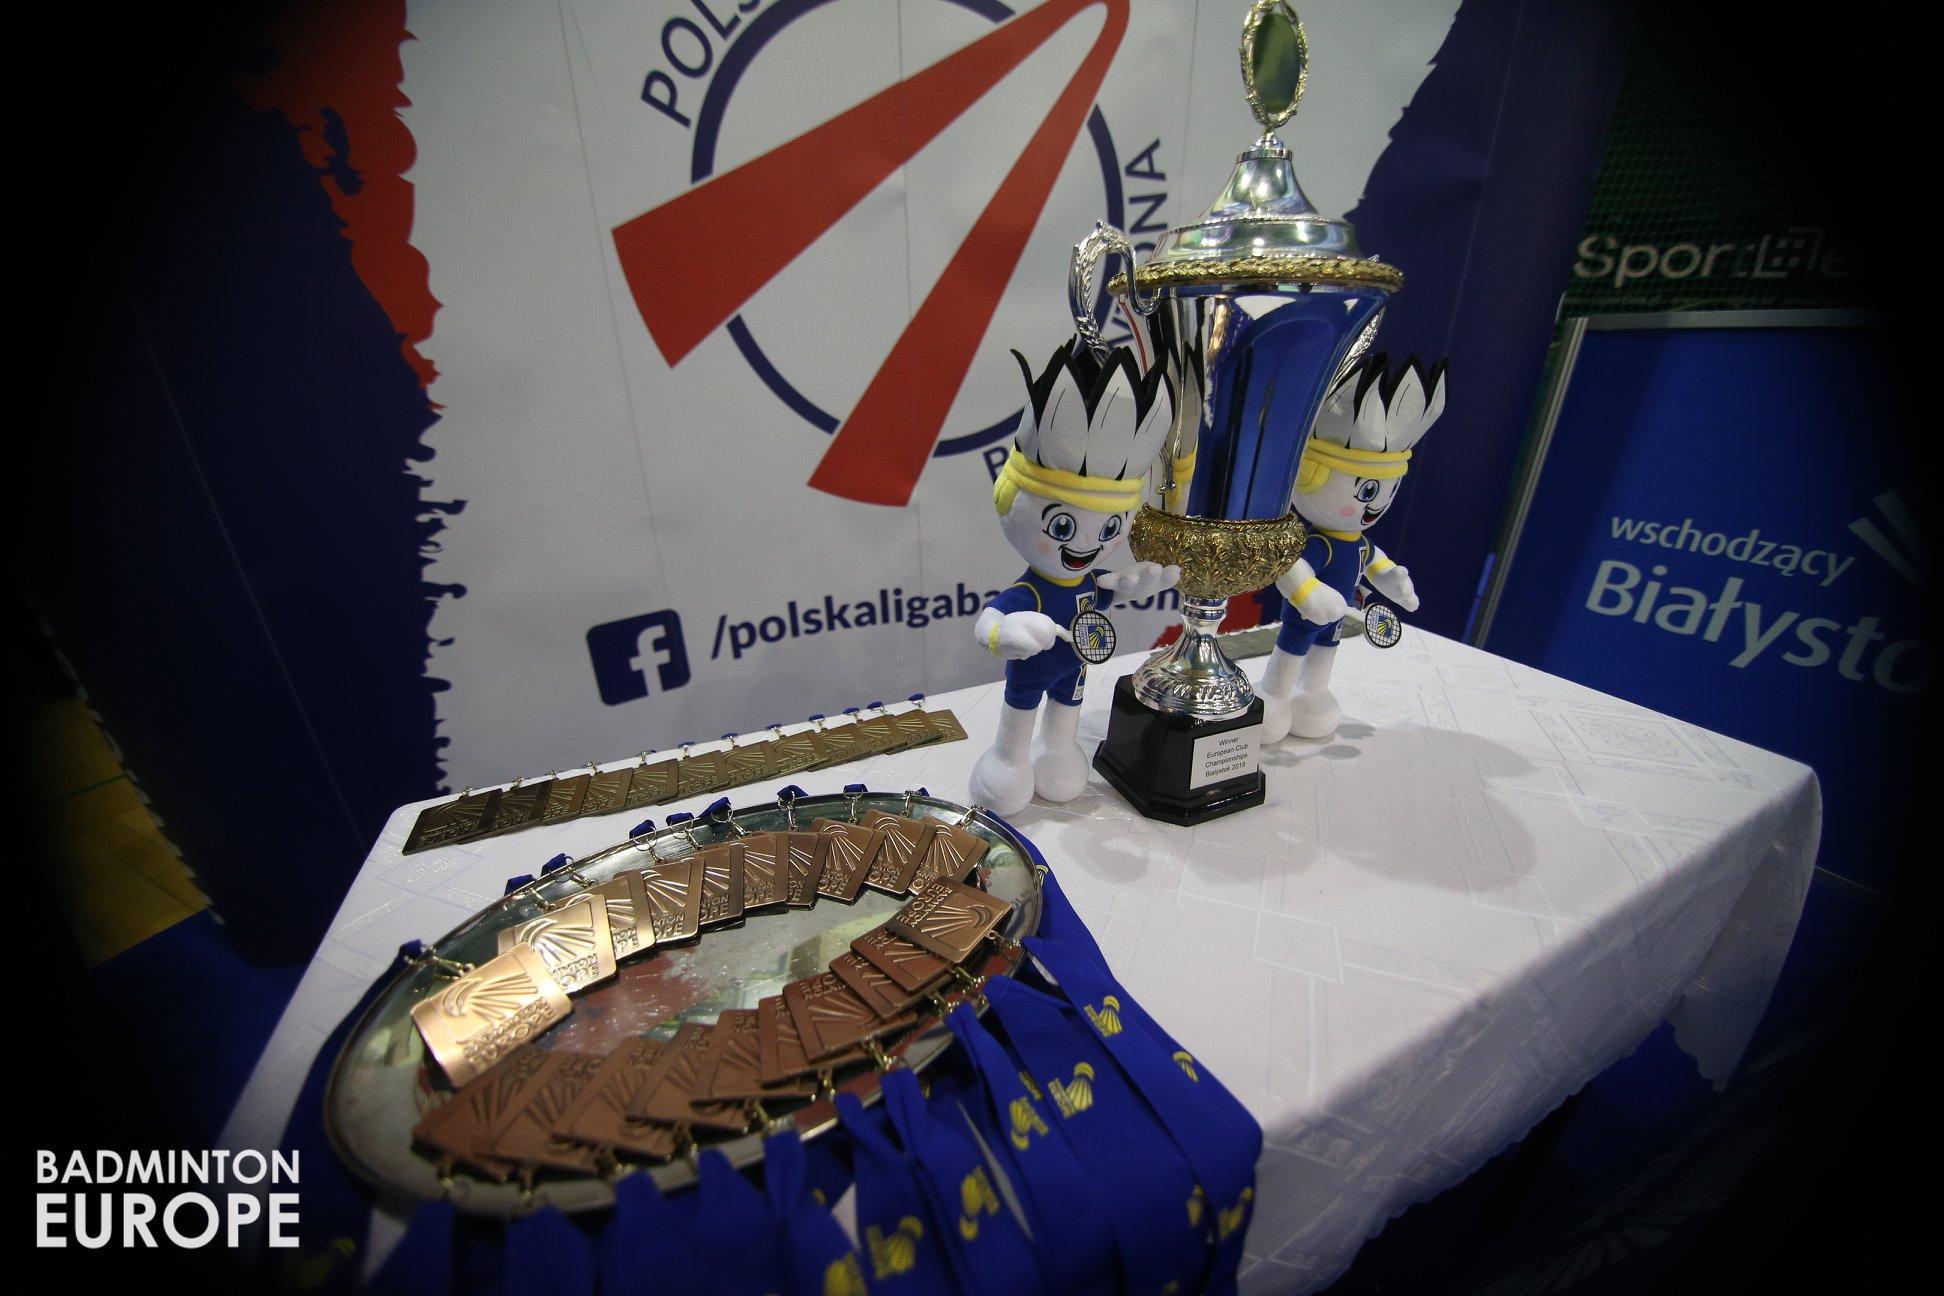 Photo credit: Badminton Europe